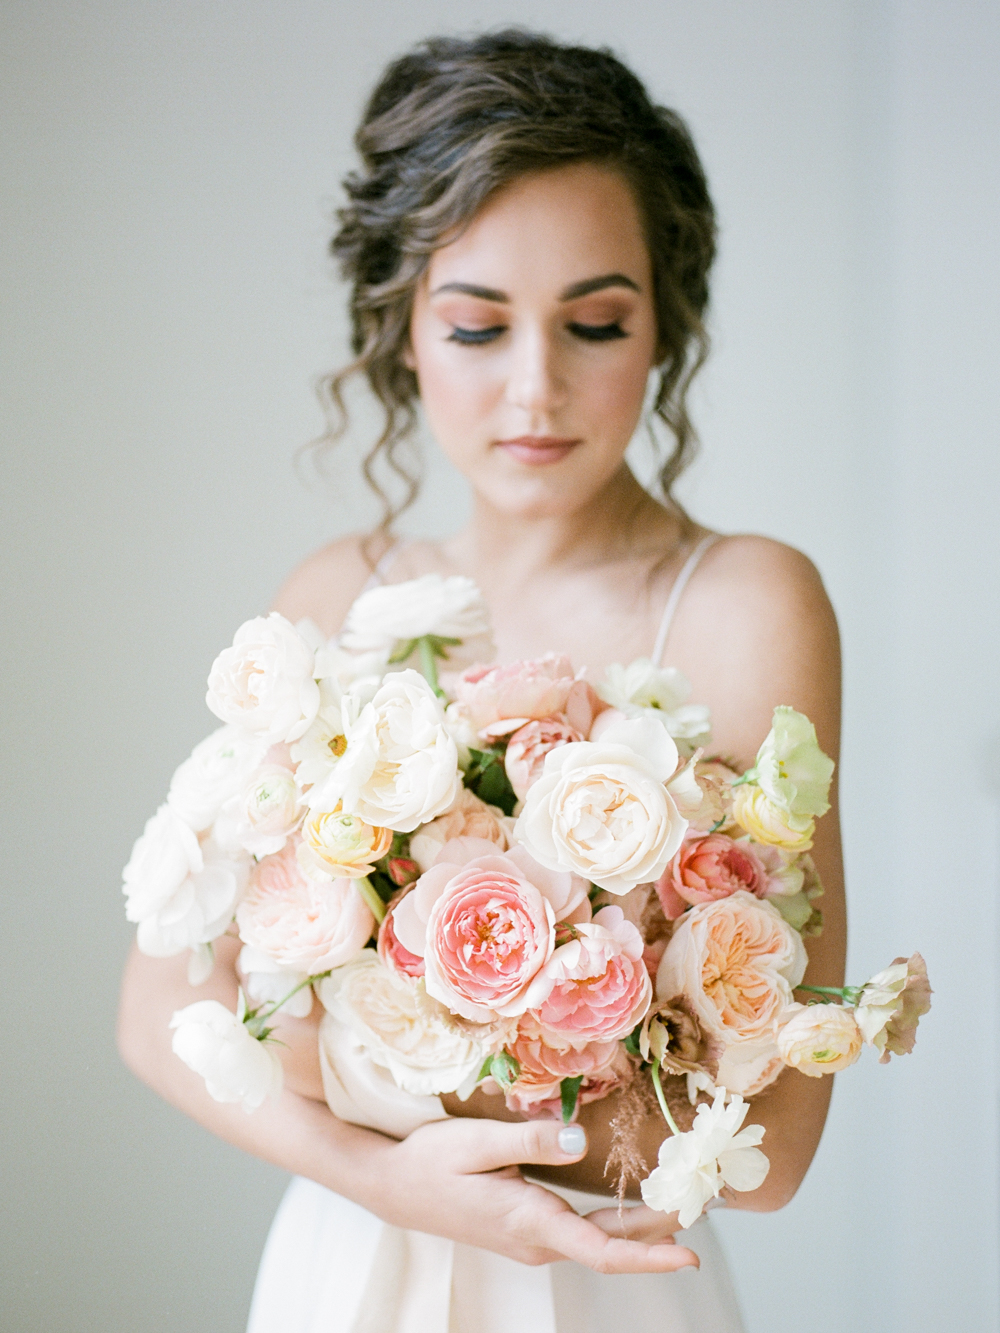 Christine Gosch - destination film photographer - houston wedding photographer - fine art film photographer - elopement photographer - destination wedding - understated wedding - simple beautiful wedding photography-96.jpg